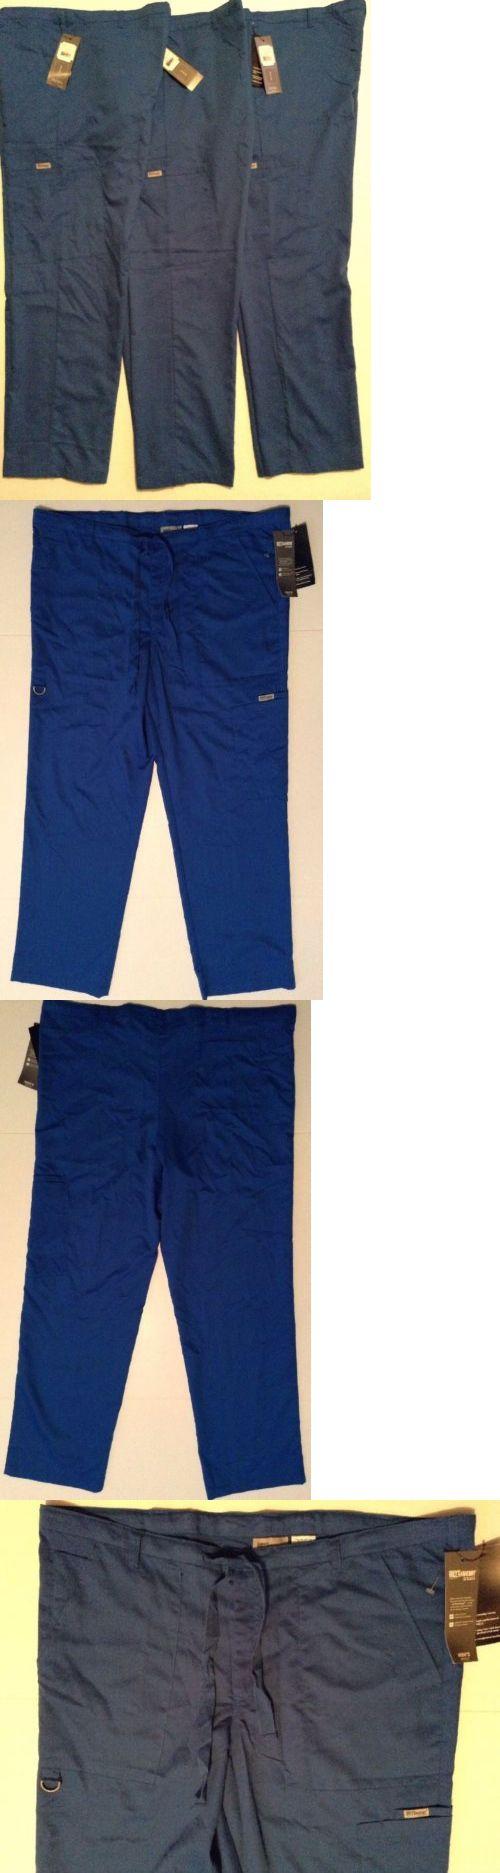 Bottoms 105422: Lot Of 3 Greys Anatomy Mens Scrub Pants 6 Pocket Drawstring Zip Fly Sz L Royal -> BUY IT NOW ONLY: $53.99 on eBay!